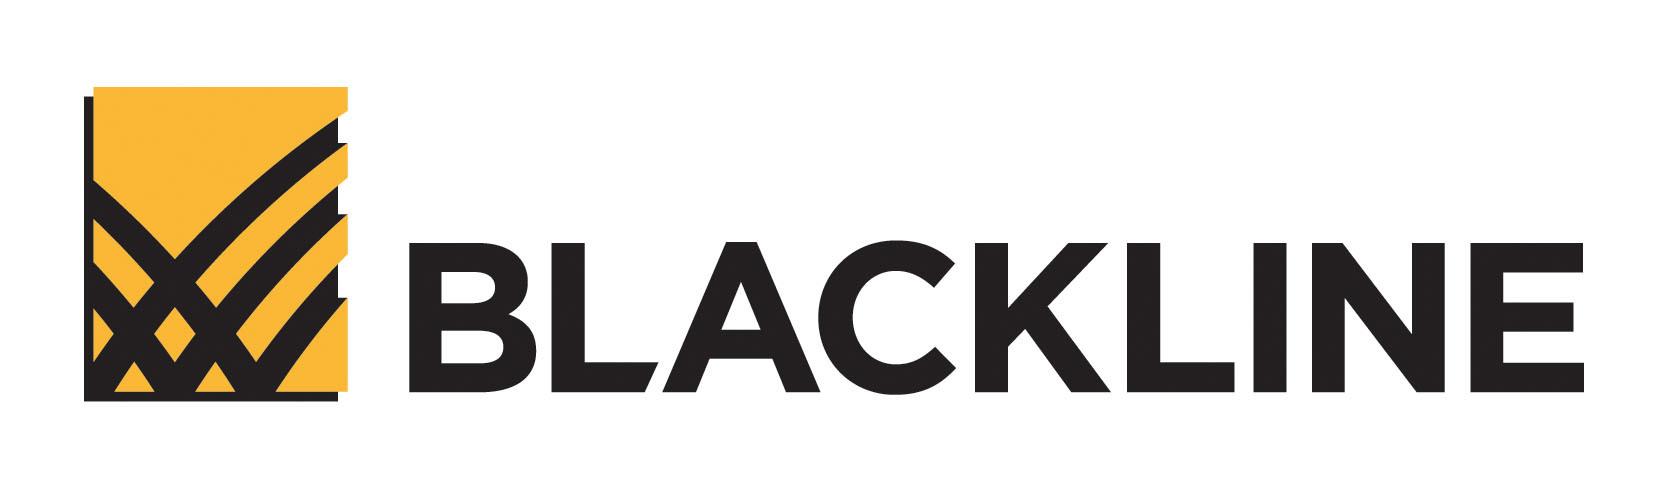 BlackLine company logo. (PRNewsFoto/BlackLine)